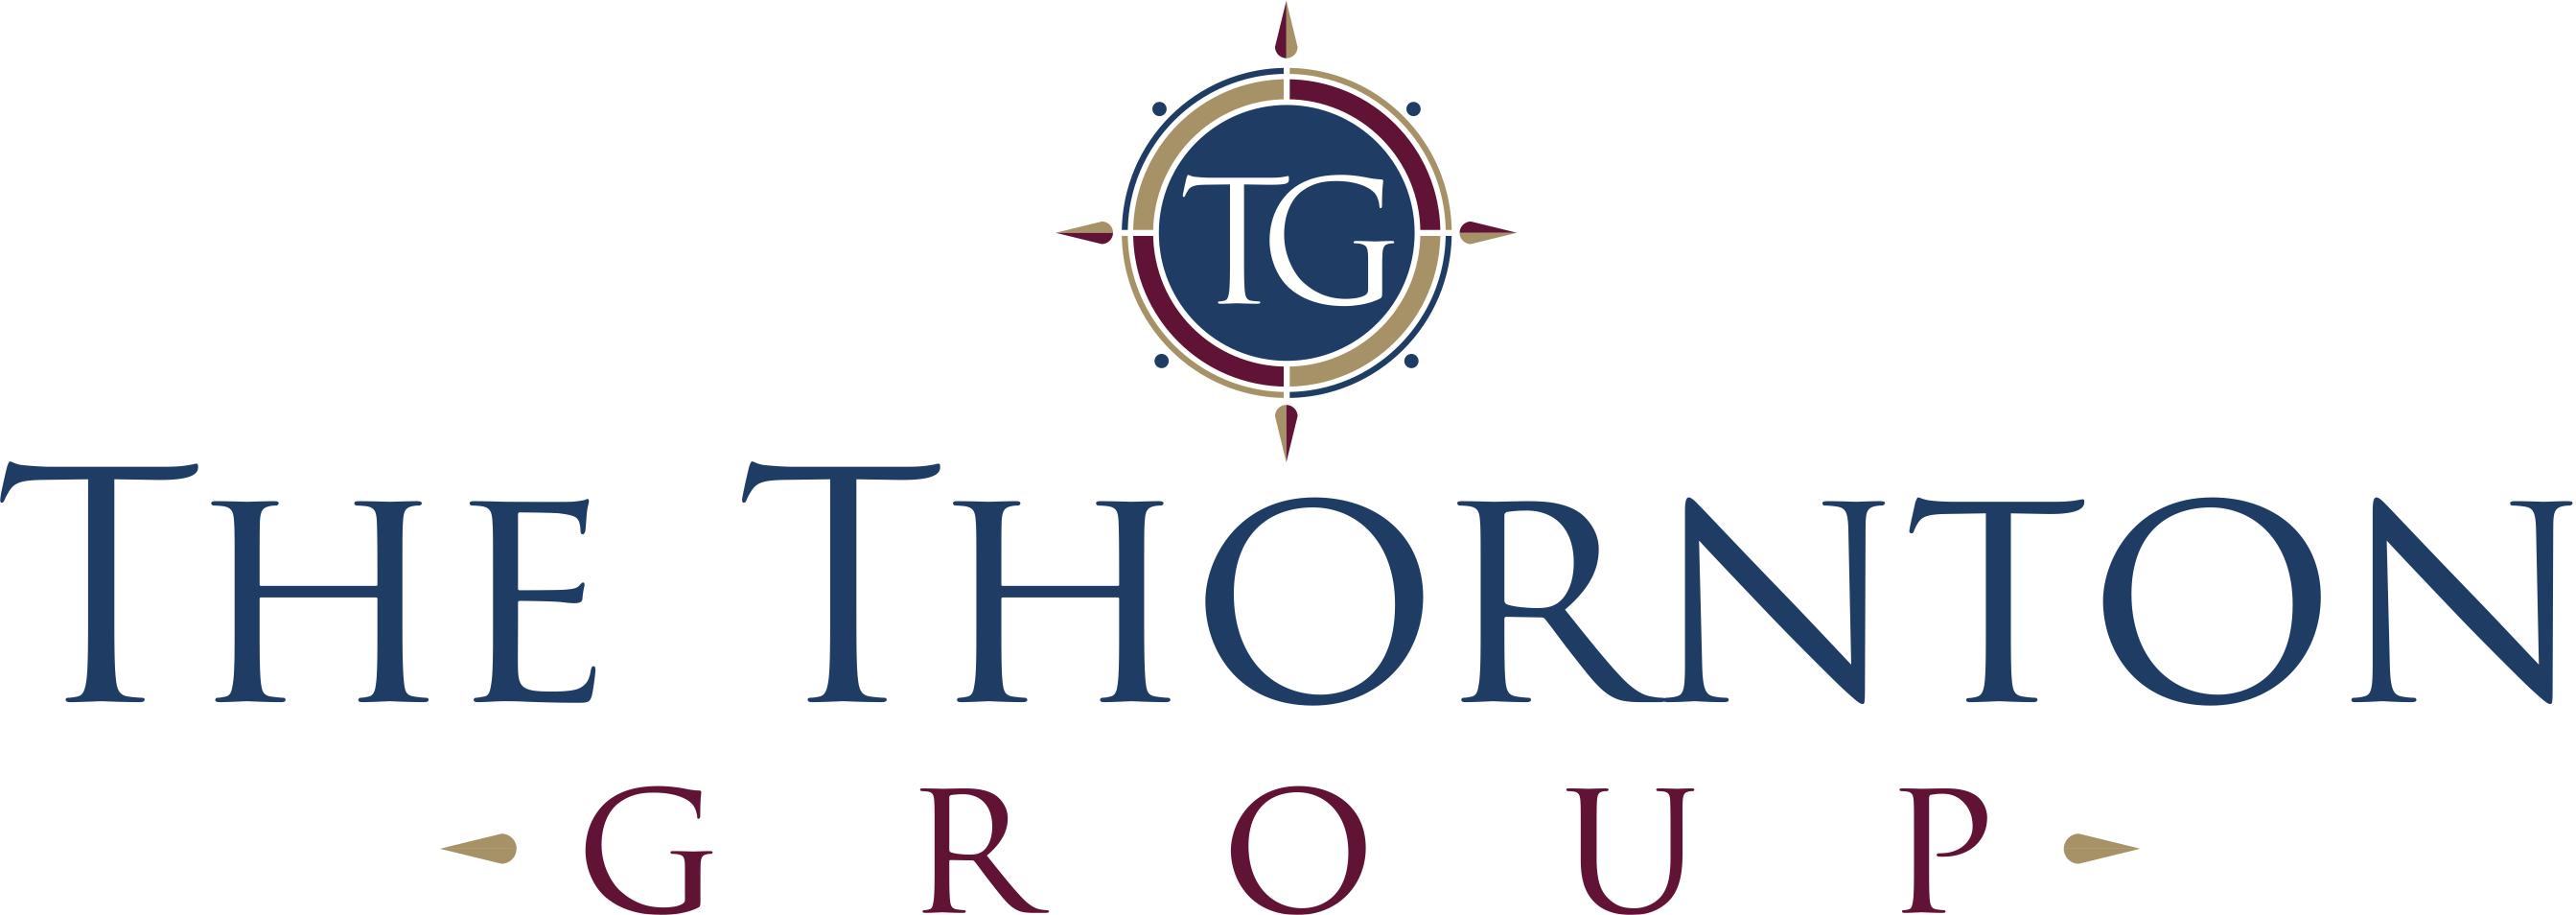 The Thornton Group